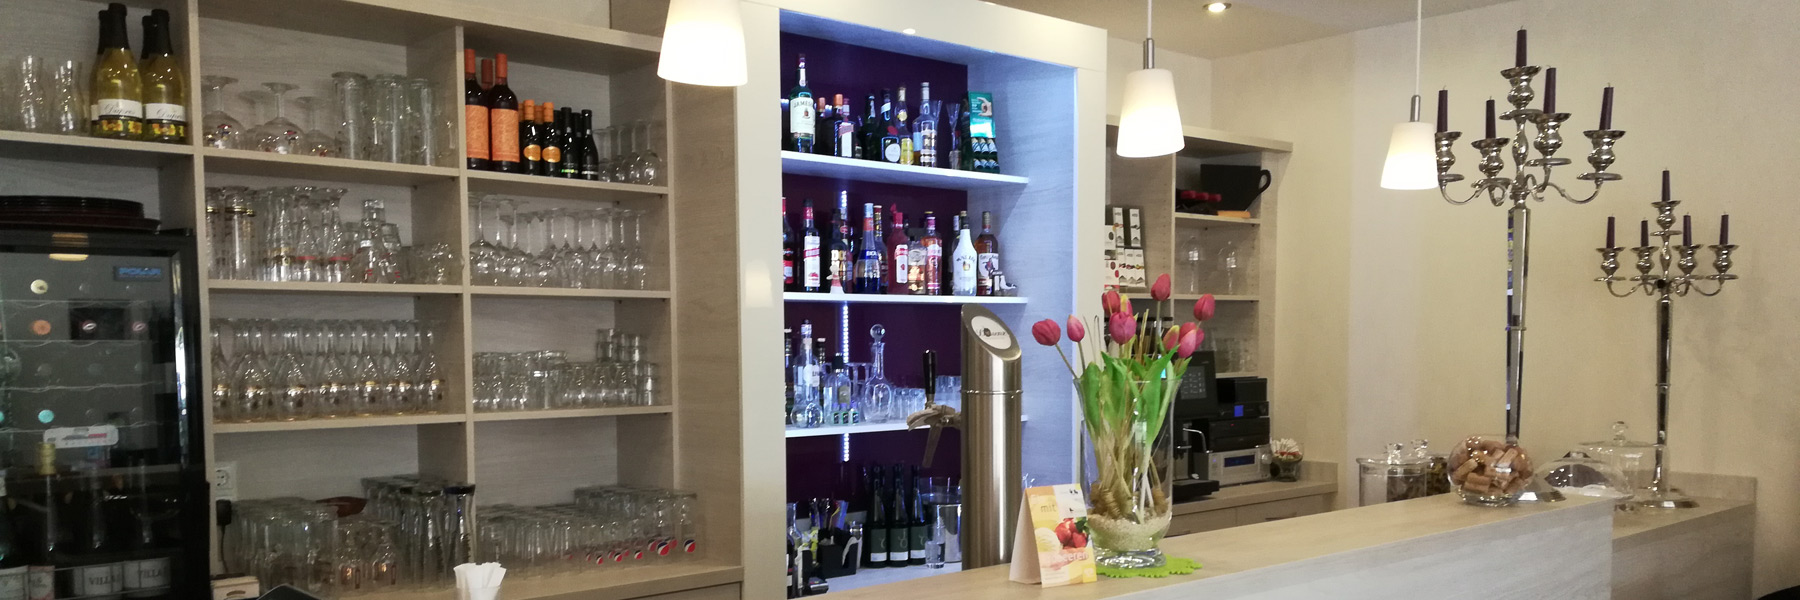 Tresen mit Tulpen - Restaurant & Café Lorenz